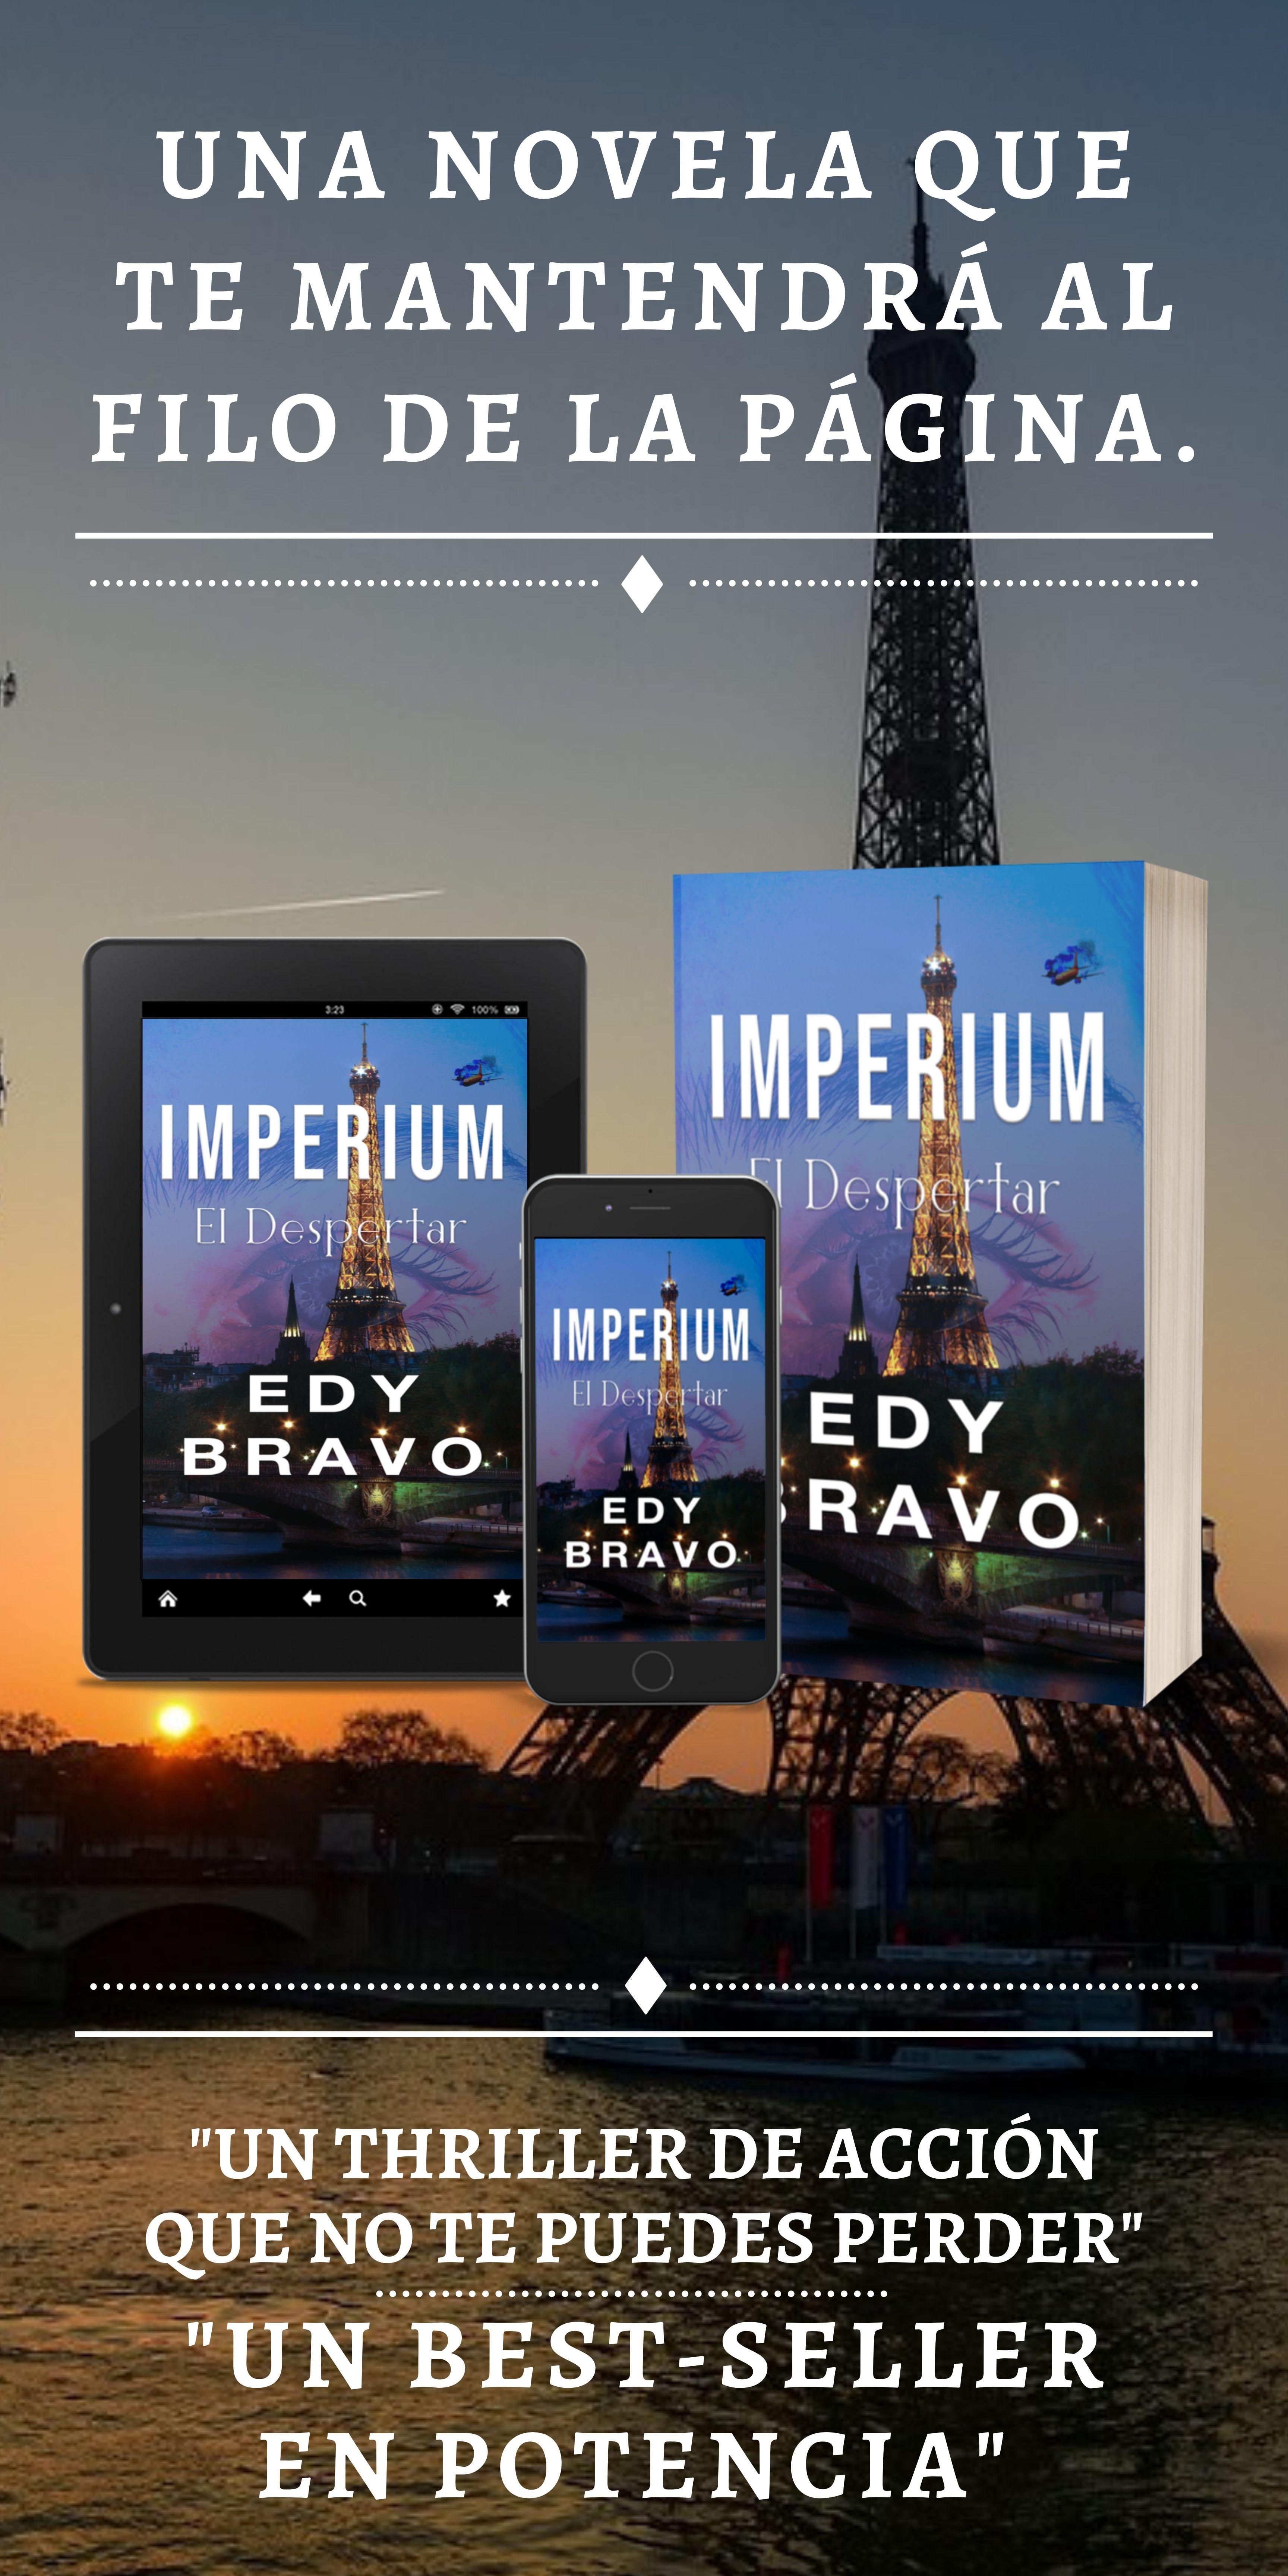 https://edybravo.com/wp-content/uploads/2021/05/imperium-el-despertar-novela-thriller-scaled.jpg